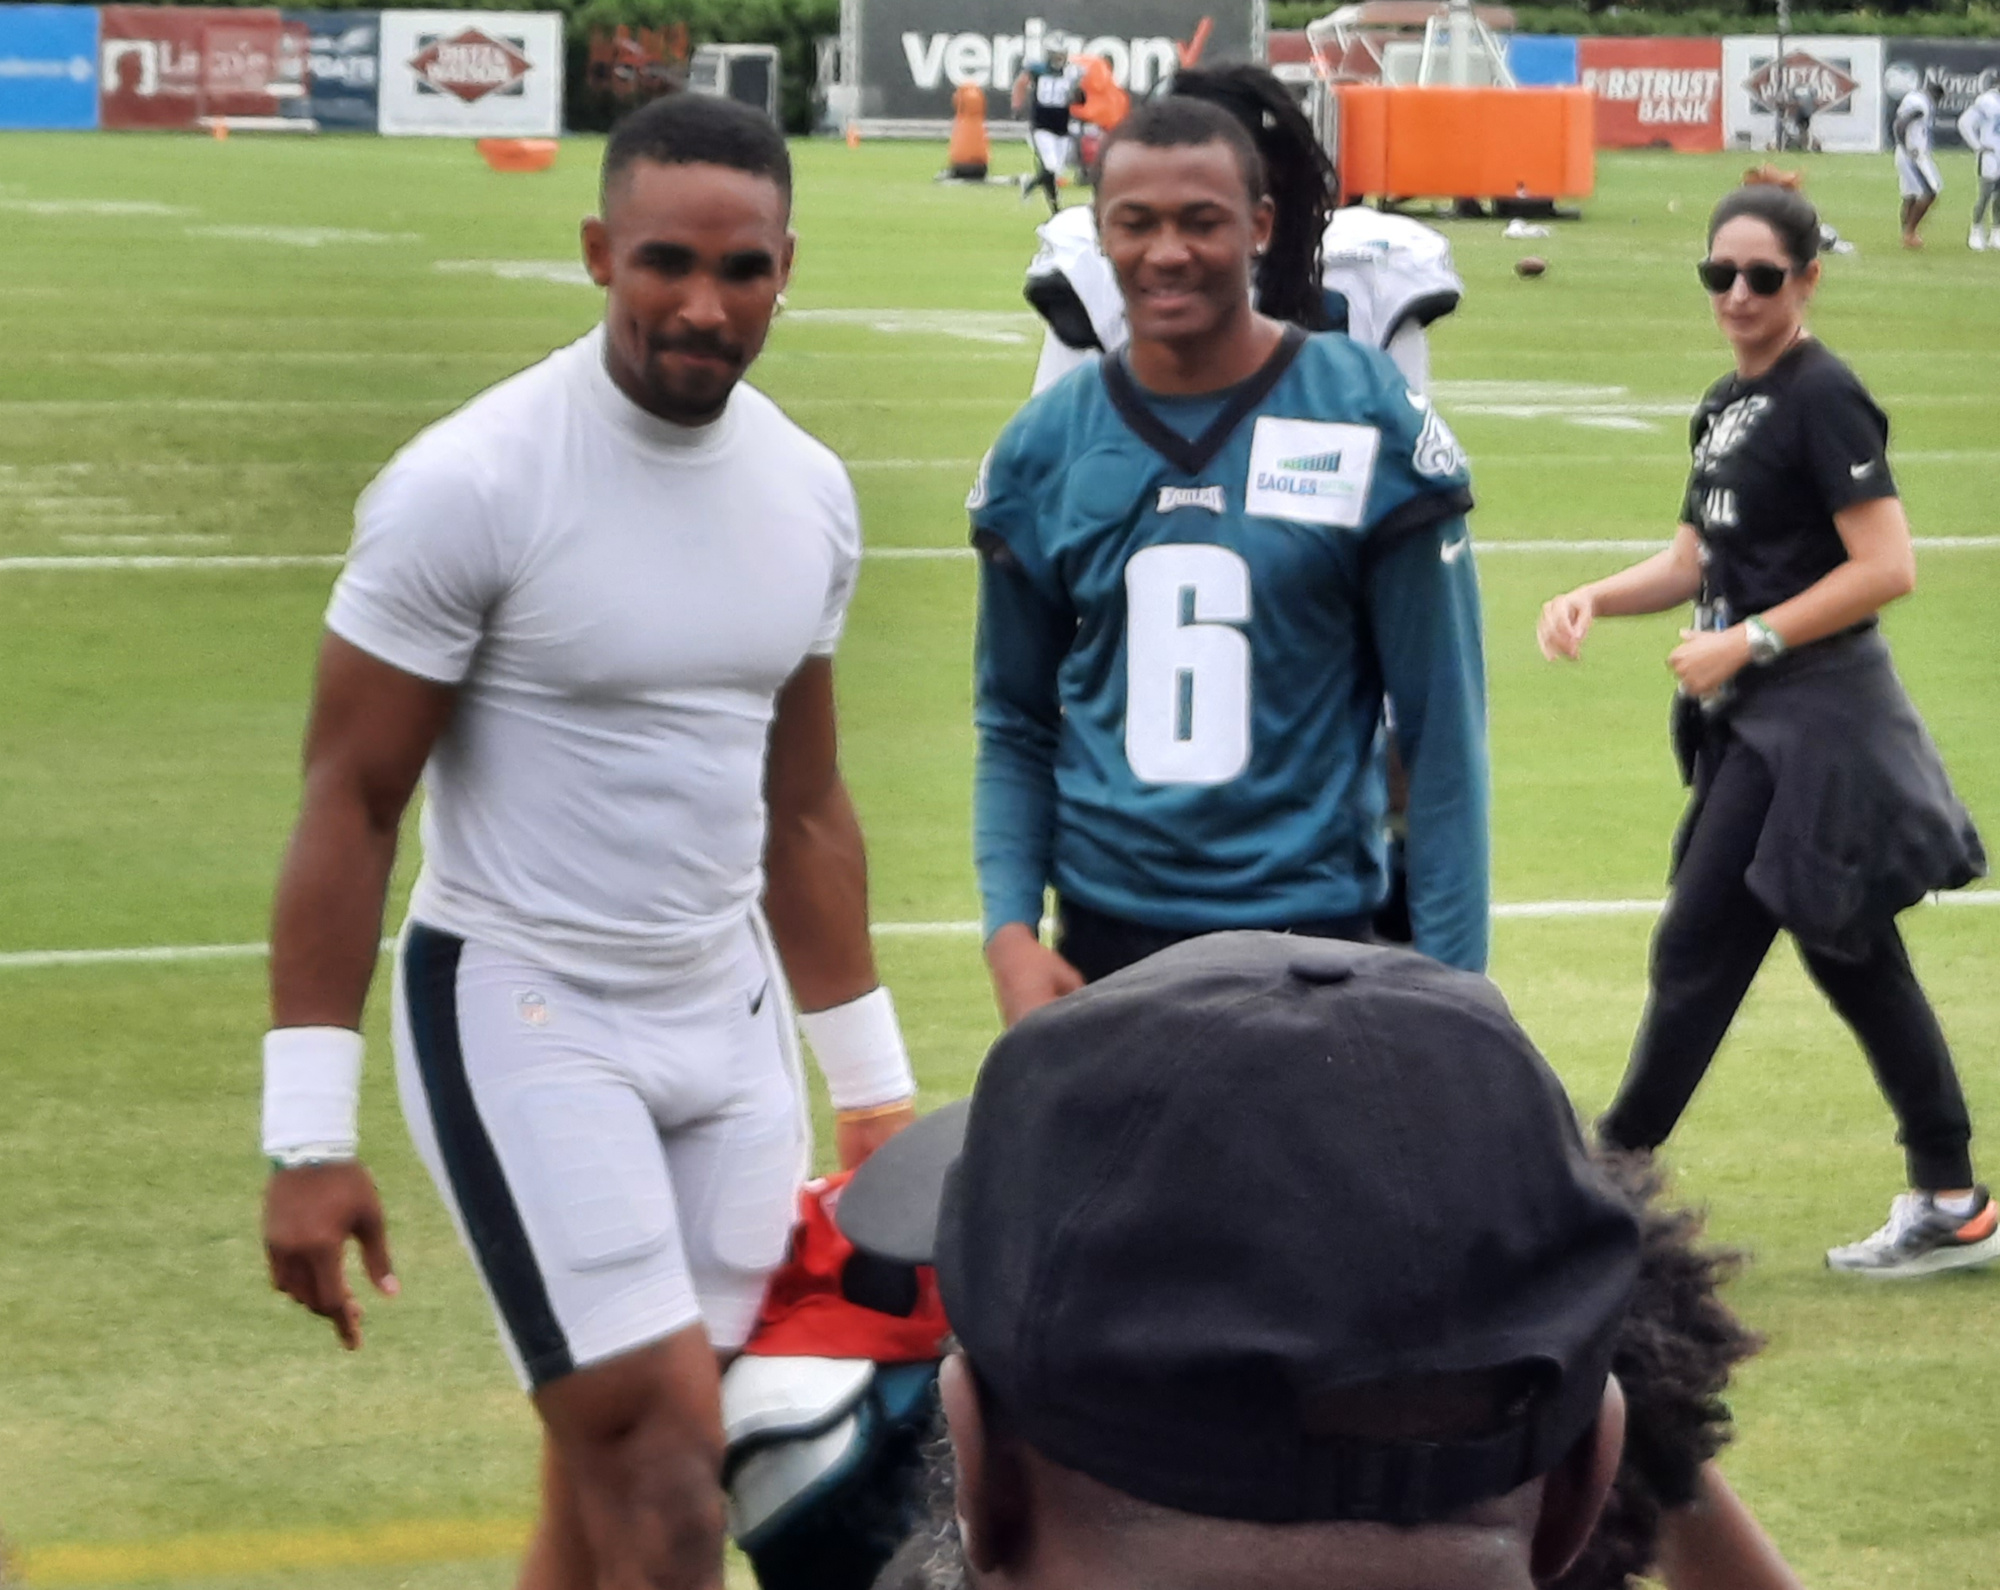 Philadelphia Eagle QB Jalen Hurts and WR DeVonta Smith